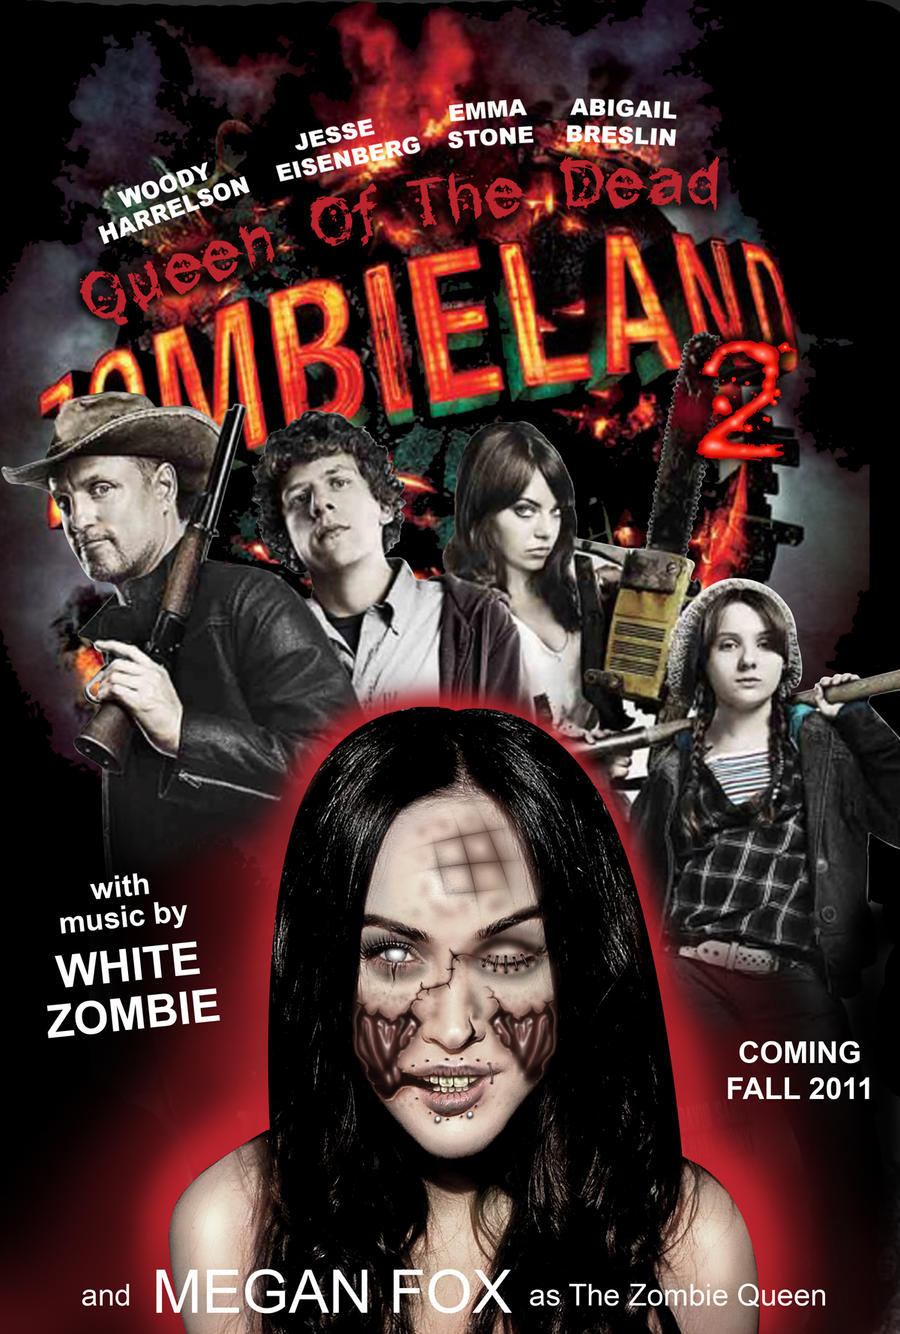 zombieland 2 - photo #19